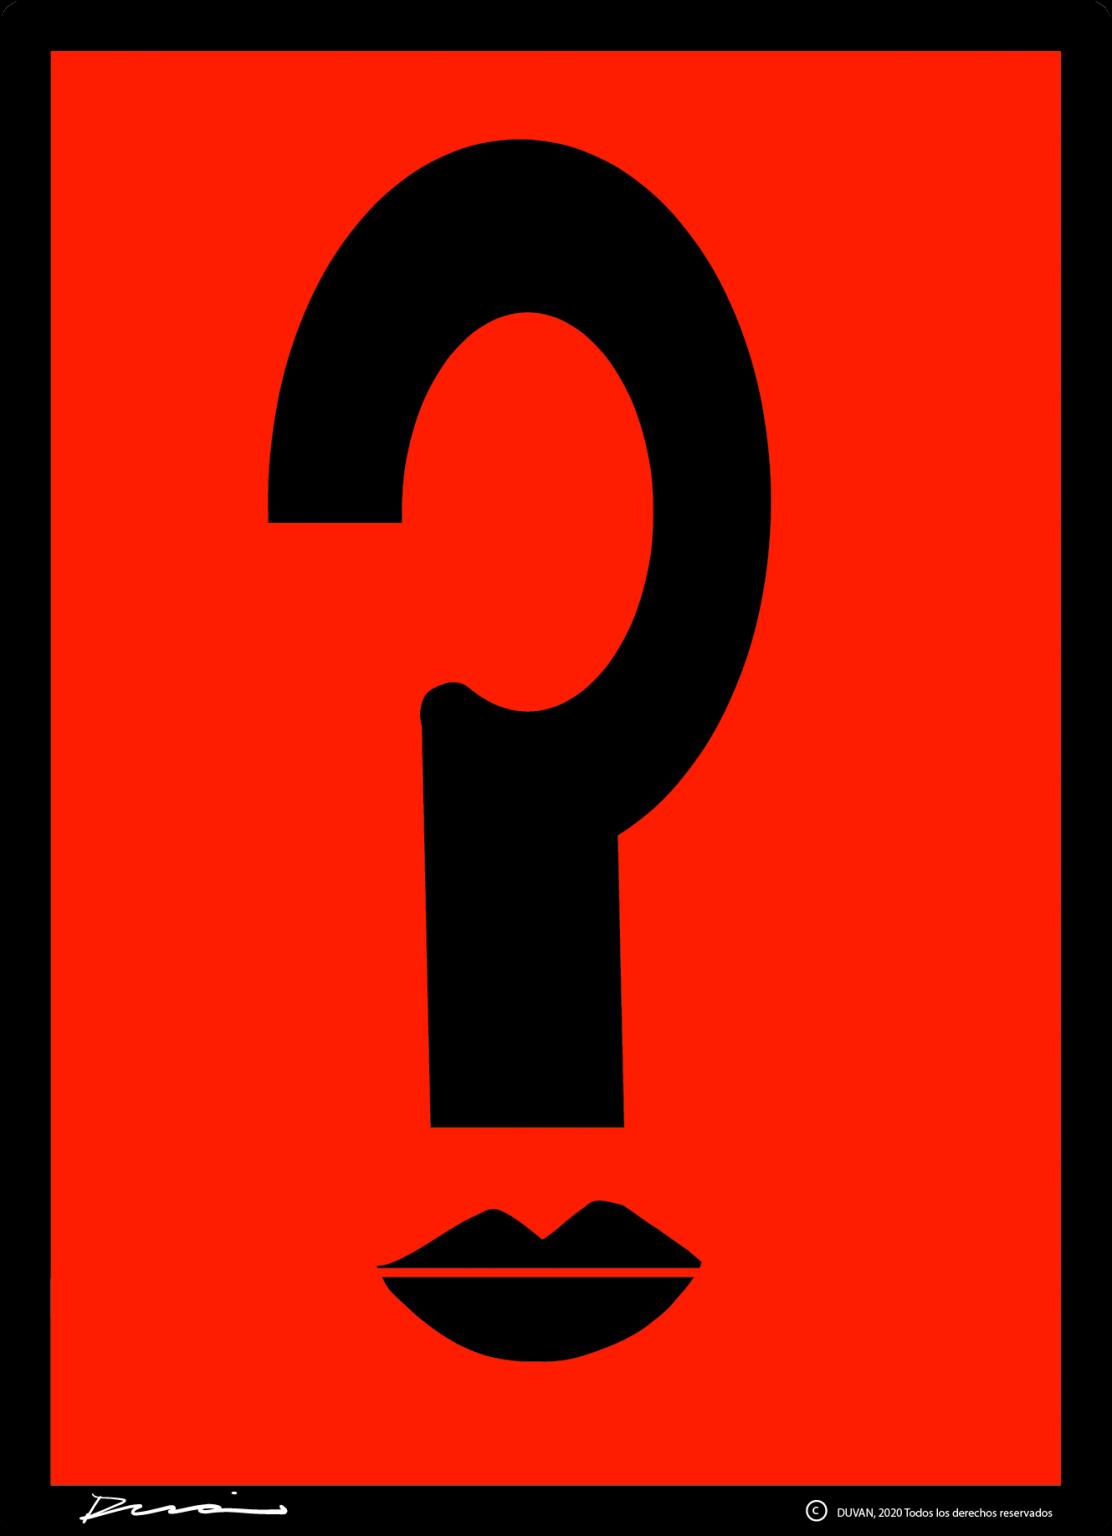 La Pregunta. Obra del Maestro Duván